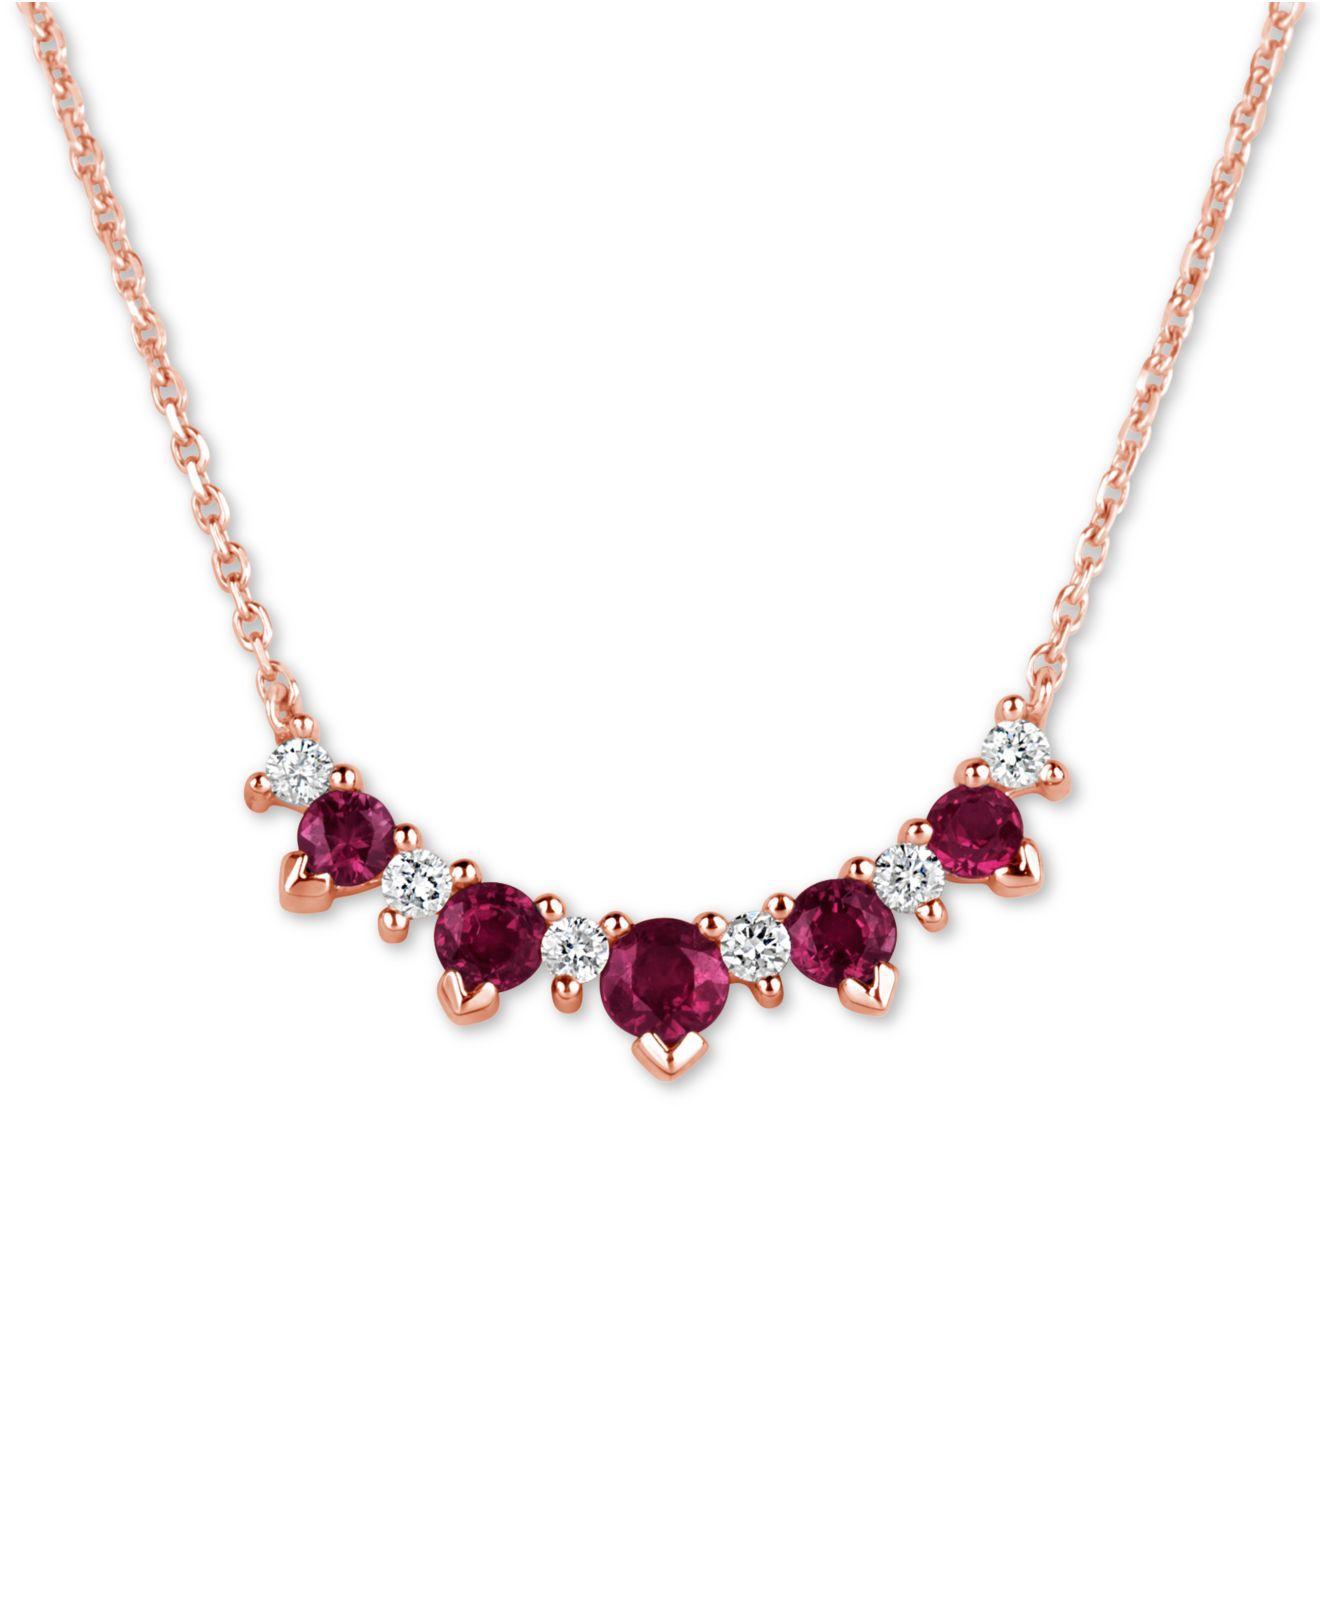 26dc4f215a6f0 Women's Red Certified Ruby (3/4 Ct. T.w.) & Diamond (1/5 Ct. T.w.) 17